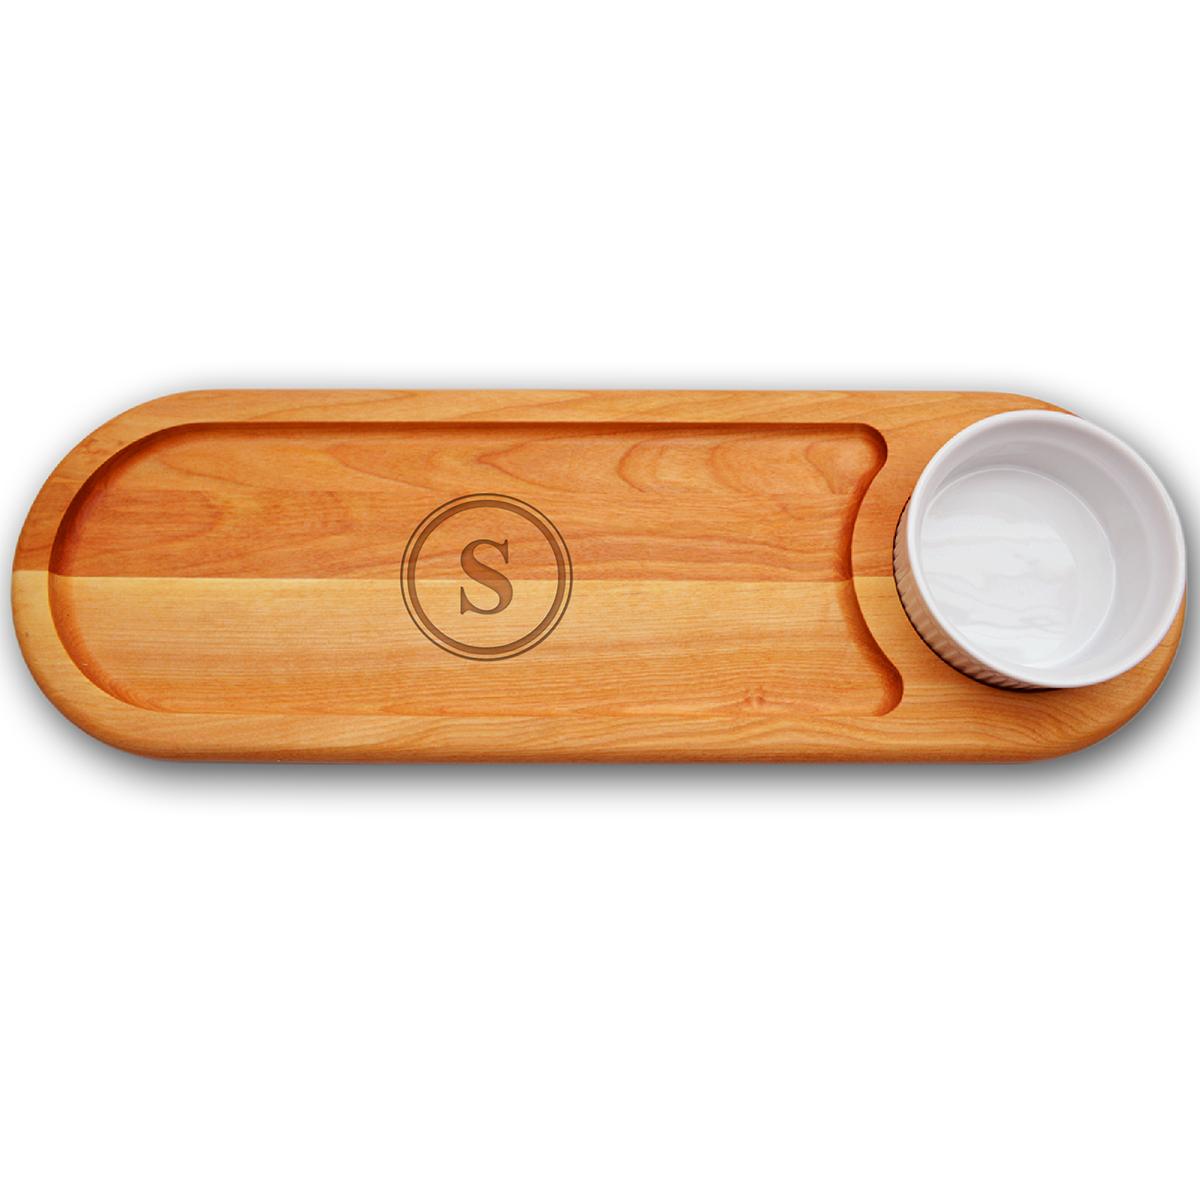 everyday-board-dip-serve-personalized-67.jpg